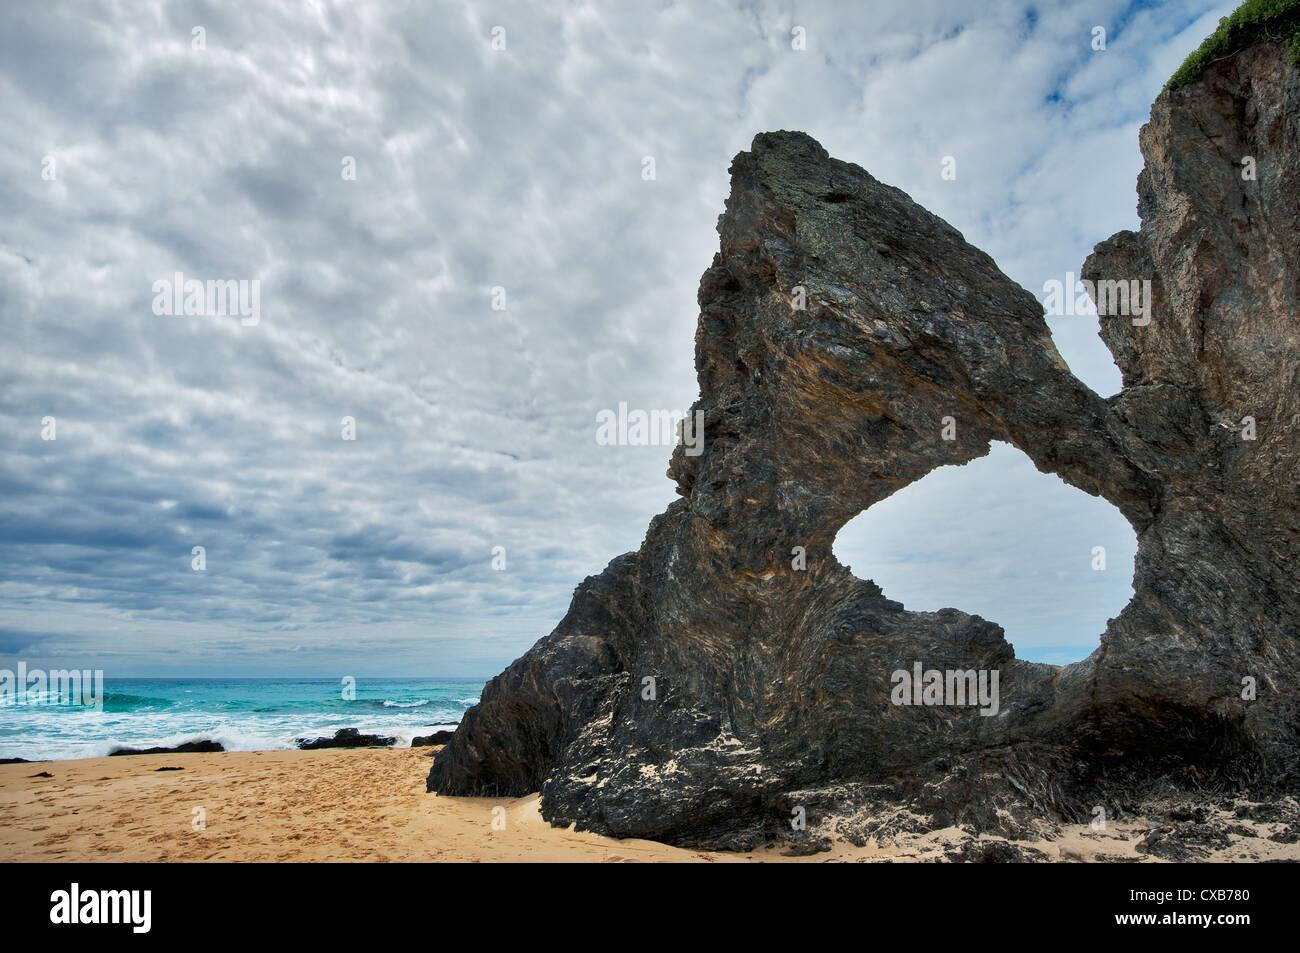 Australia Rock at the beach of Narooma. - Stock Image